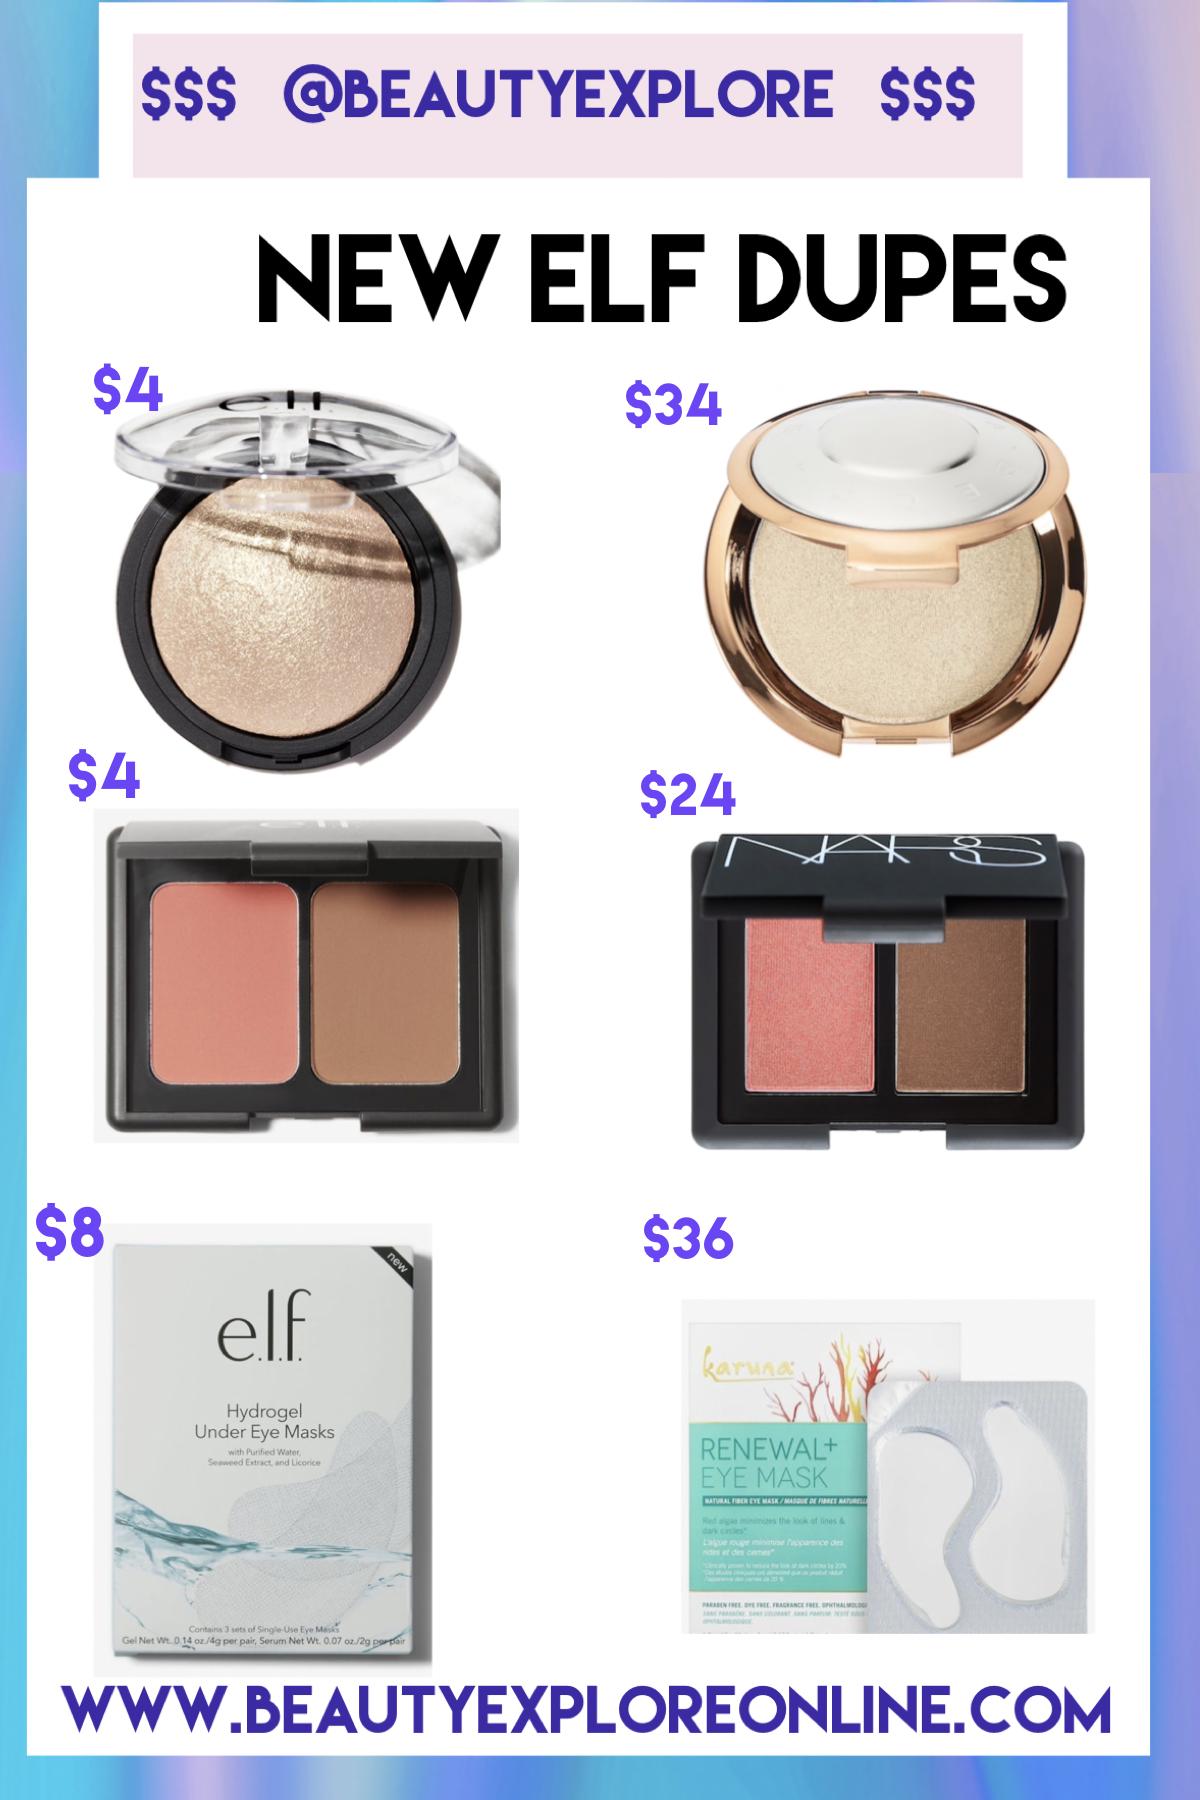 New Dupes Sephora vs. e.l.f. Save Money! Elf dupes